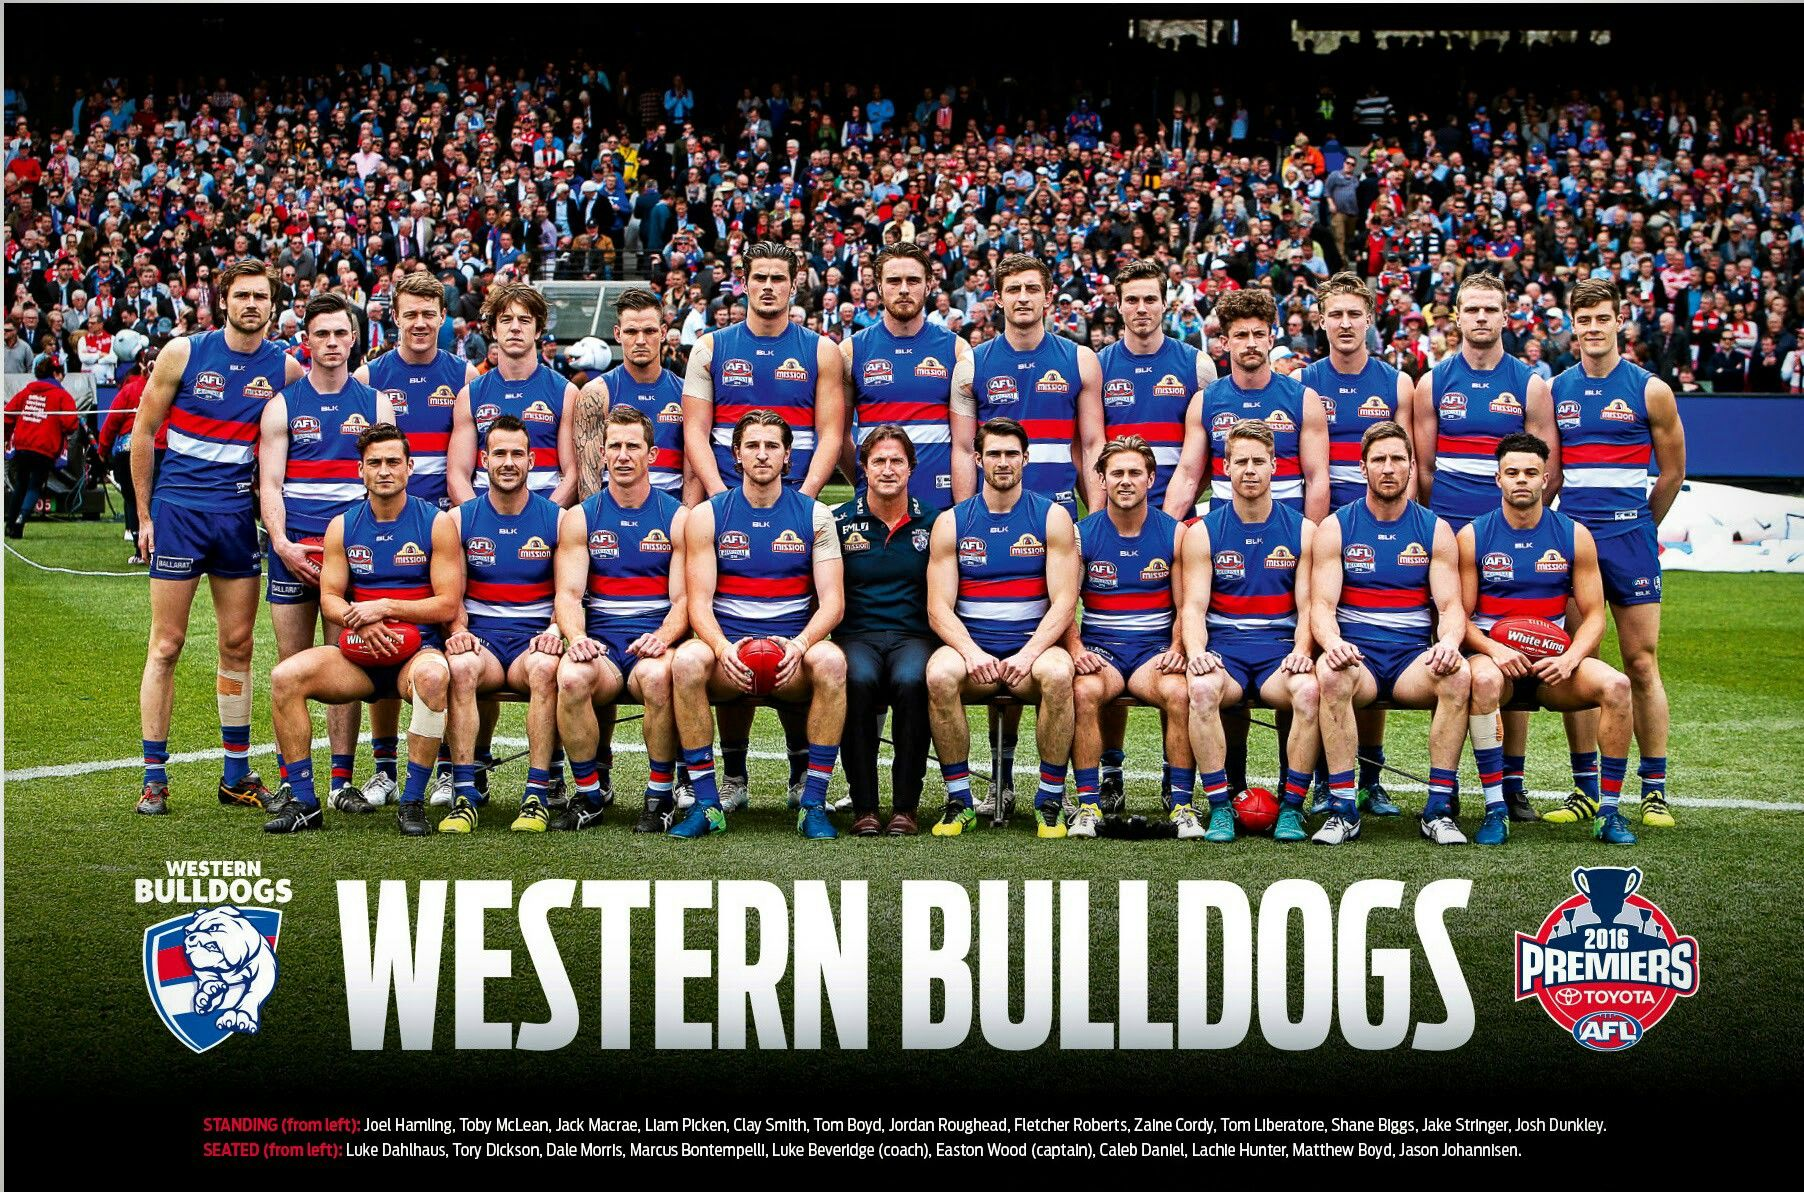 Pin by Sluricain on Western Bulldogs (AFL/VFL/AFLW